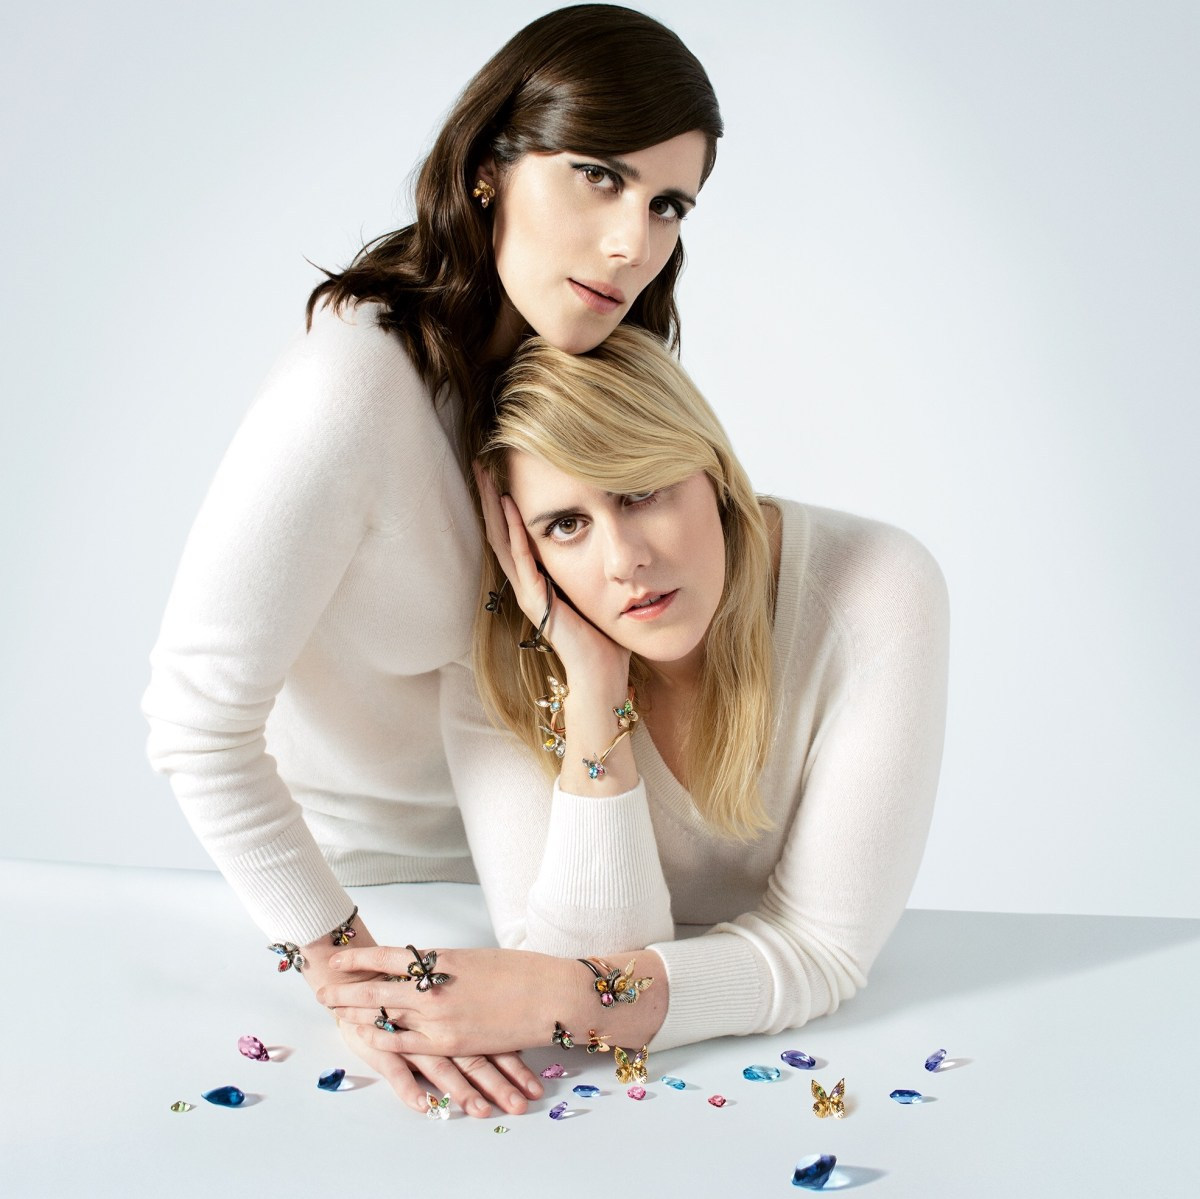 Kate & Laura Mulleavy of Rodarte